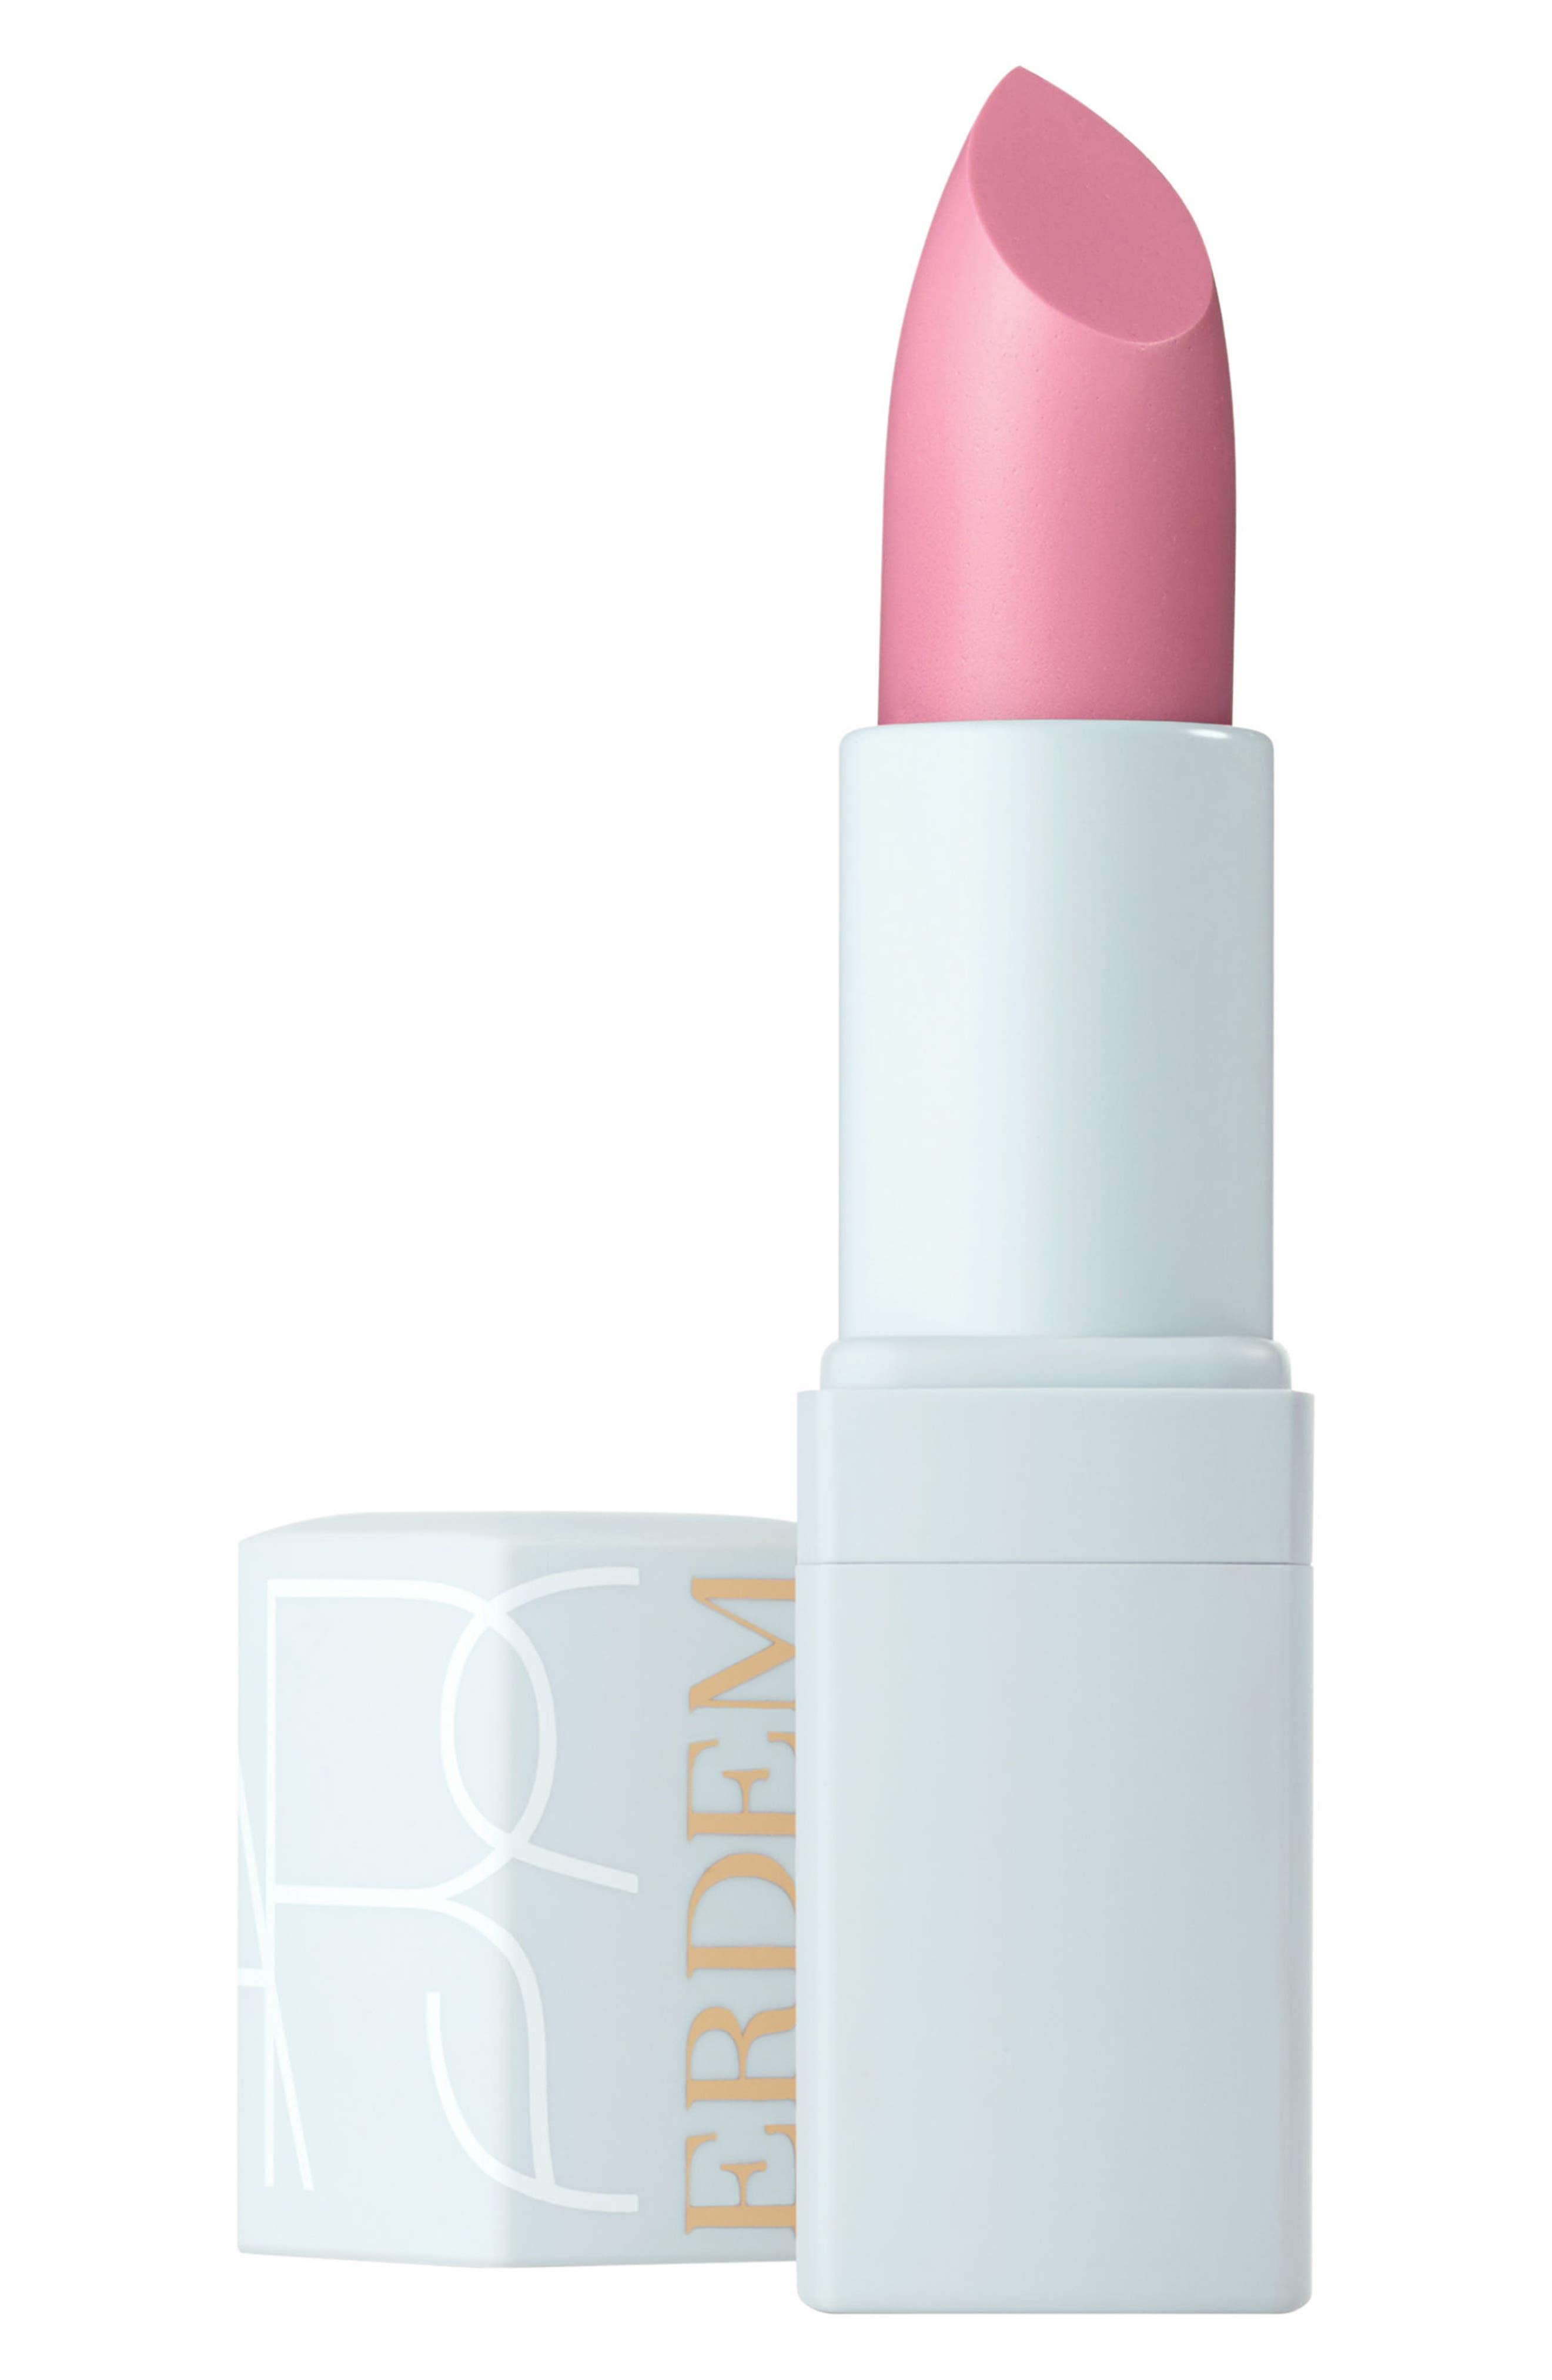 NARS x Erdem Strange Flowers Lipstick (Limited Edition)